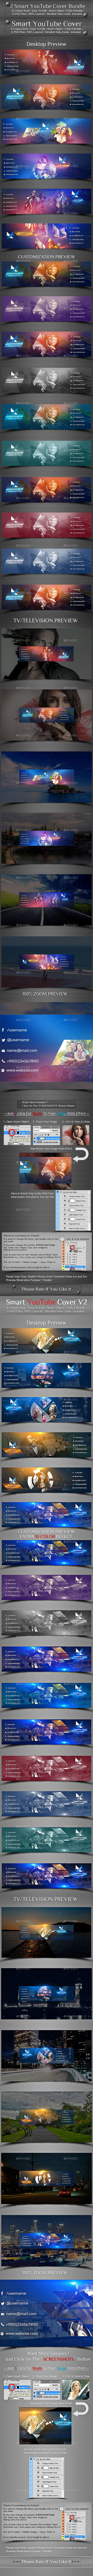 2 Smart YouTube Cover Bundle - YouTube Social Media